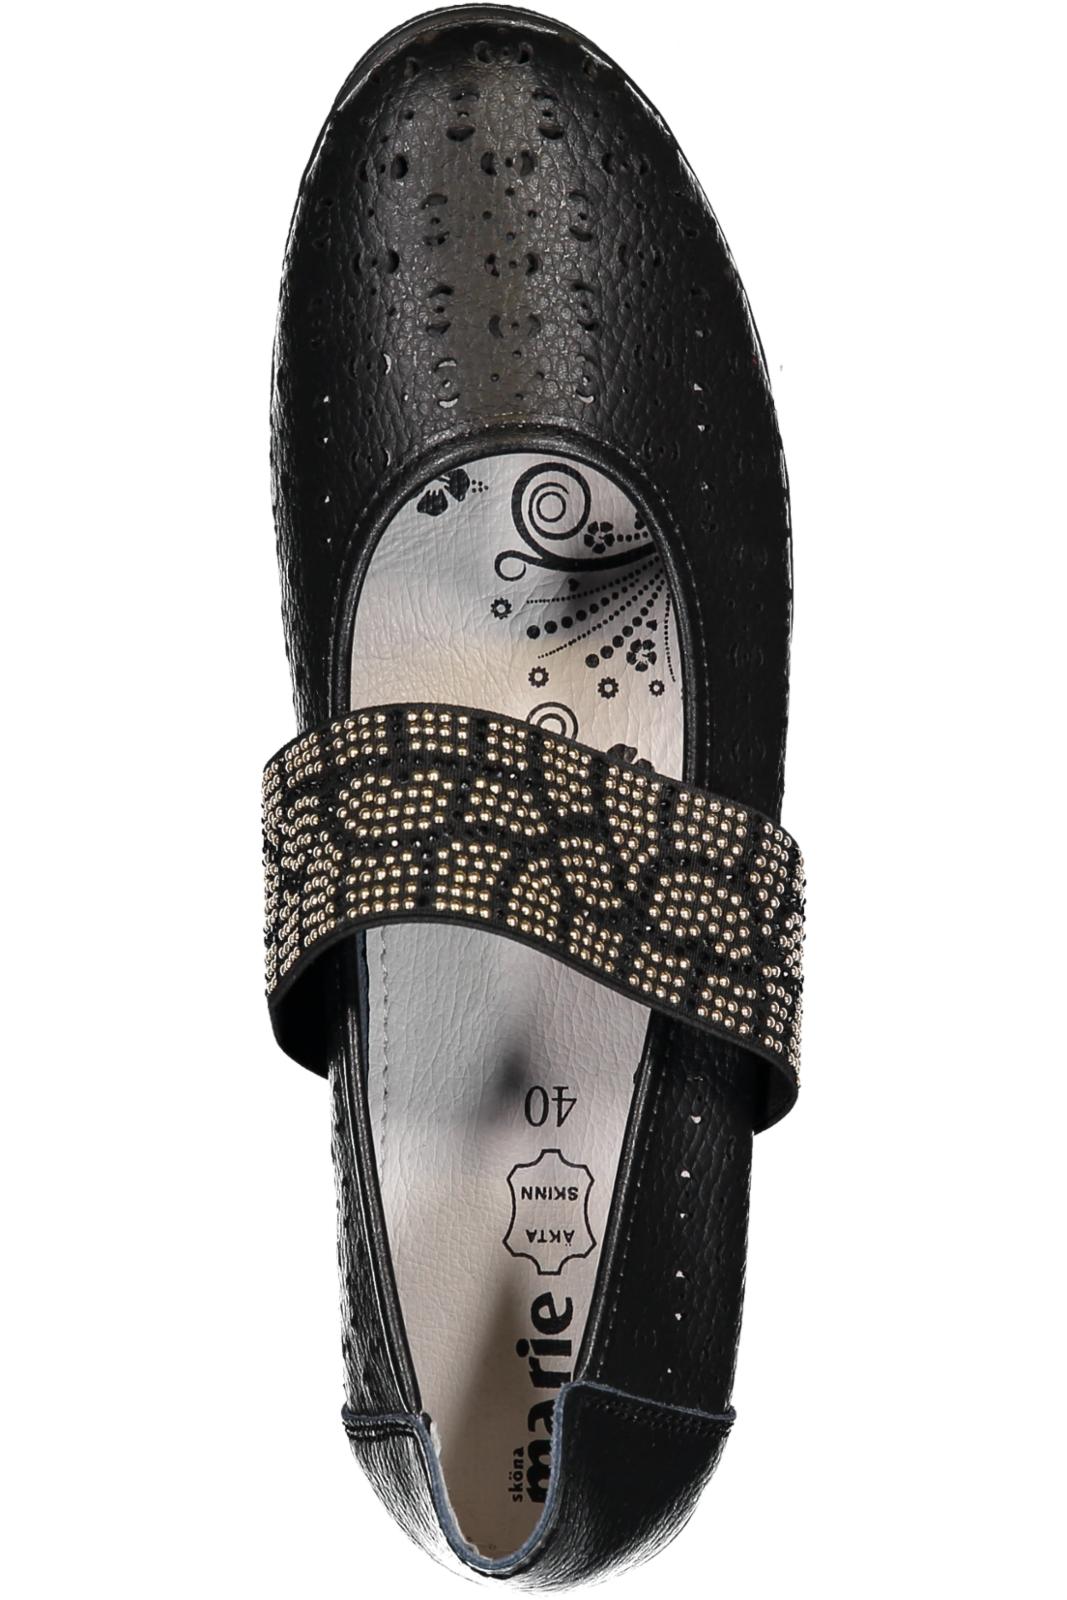 billiga sköna marie skor